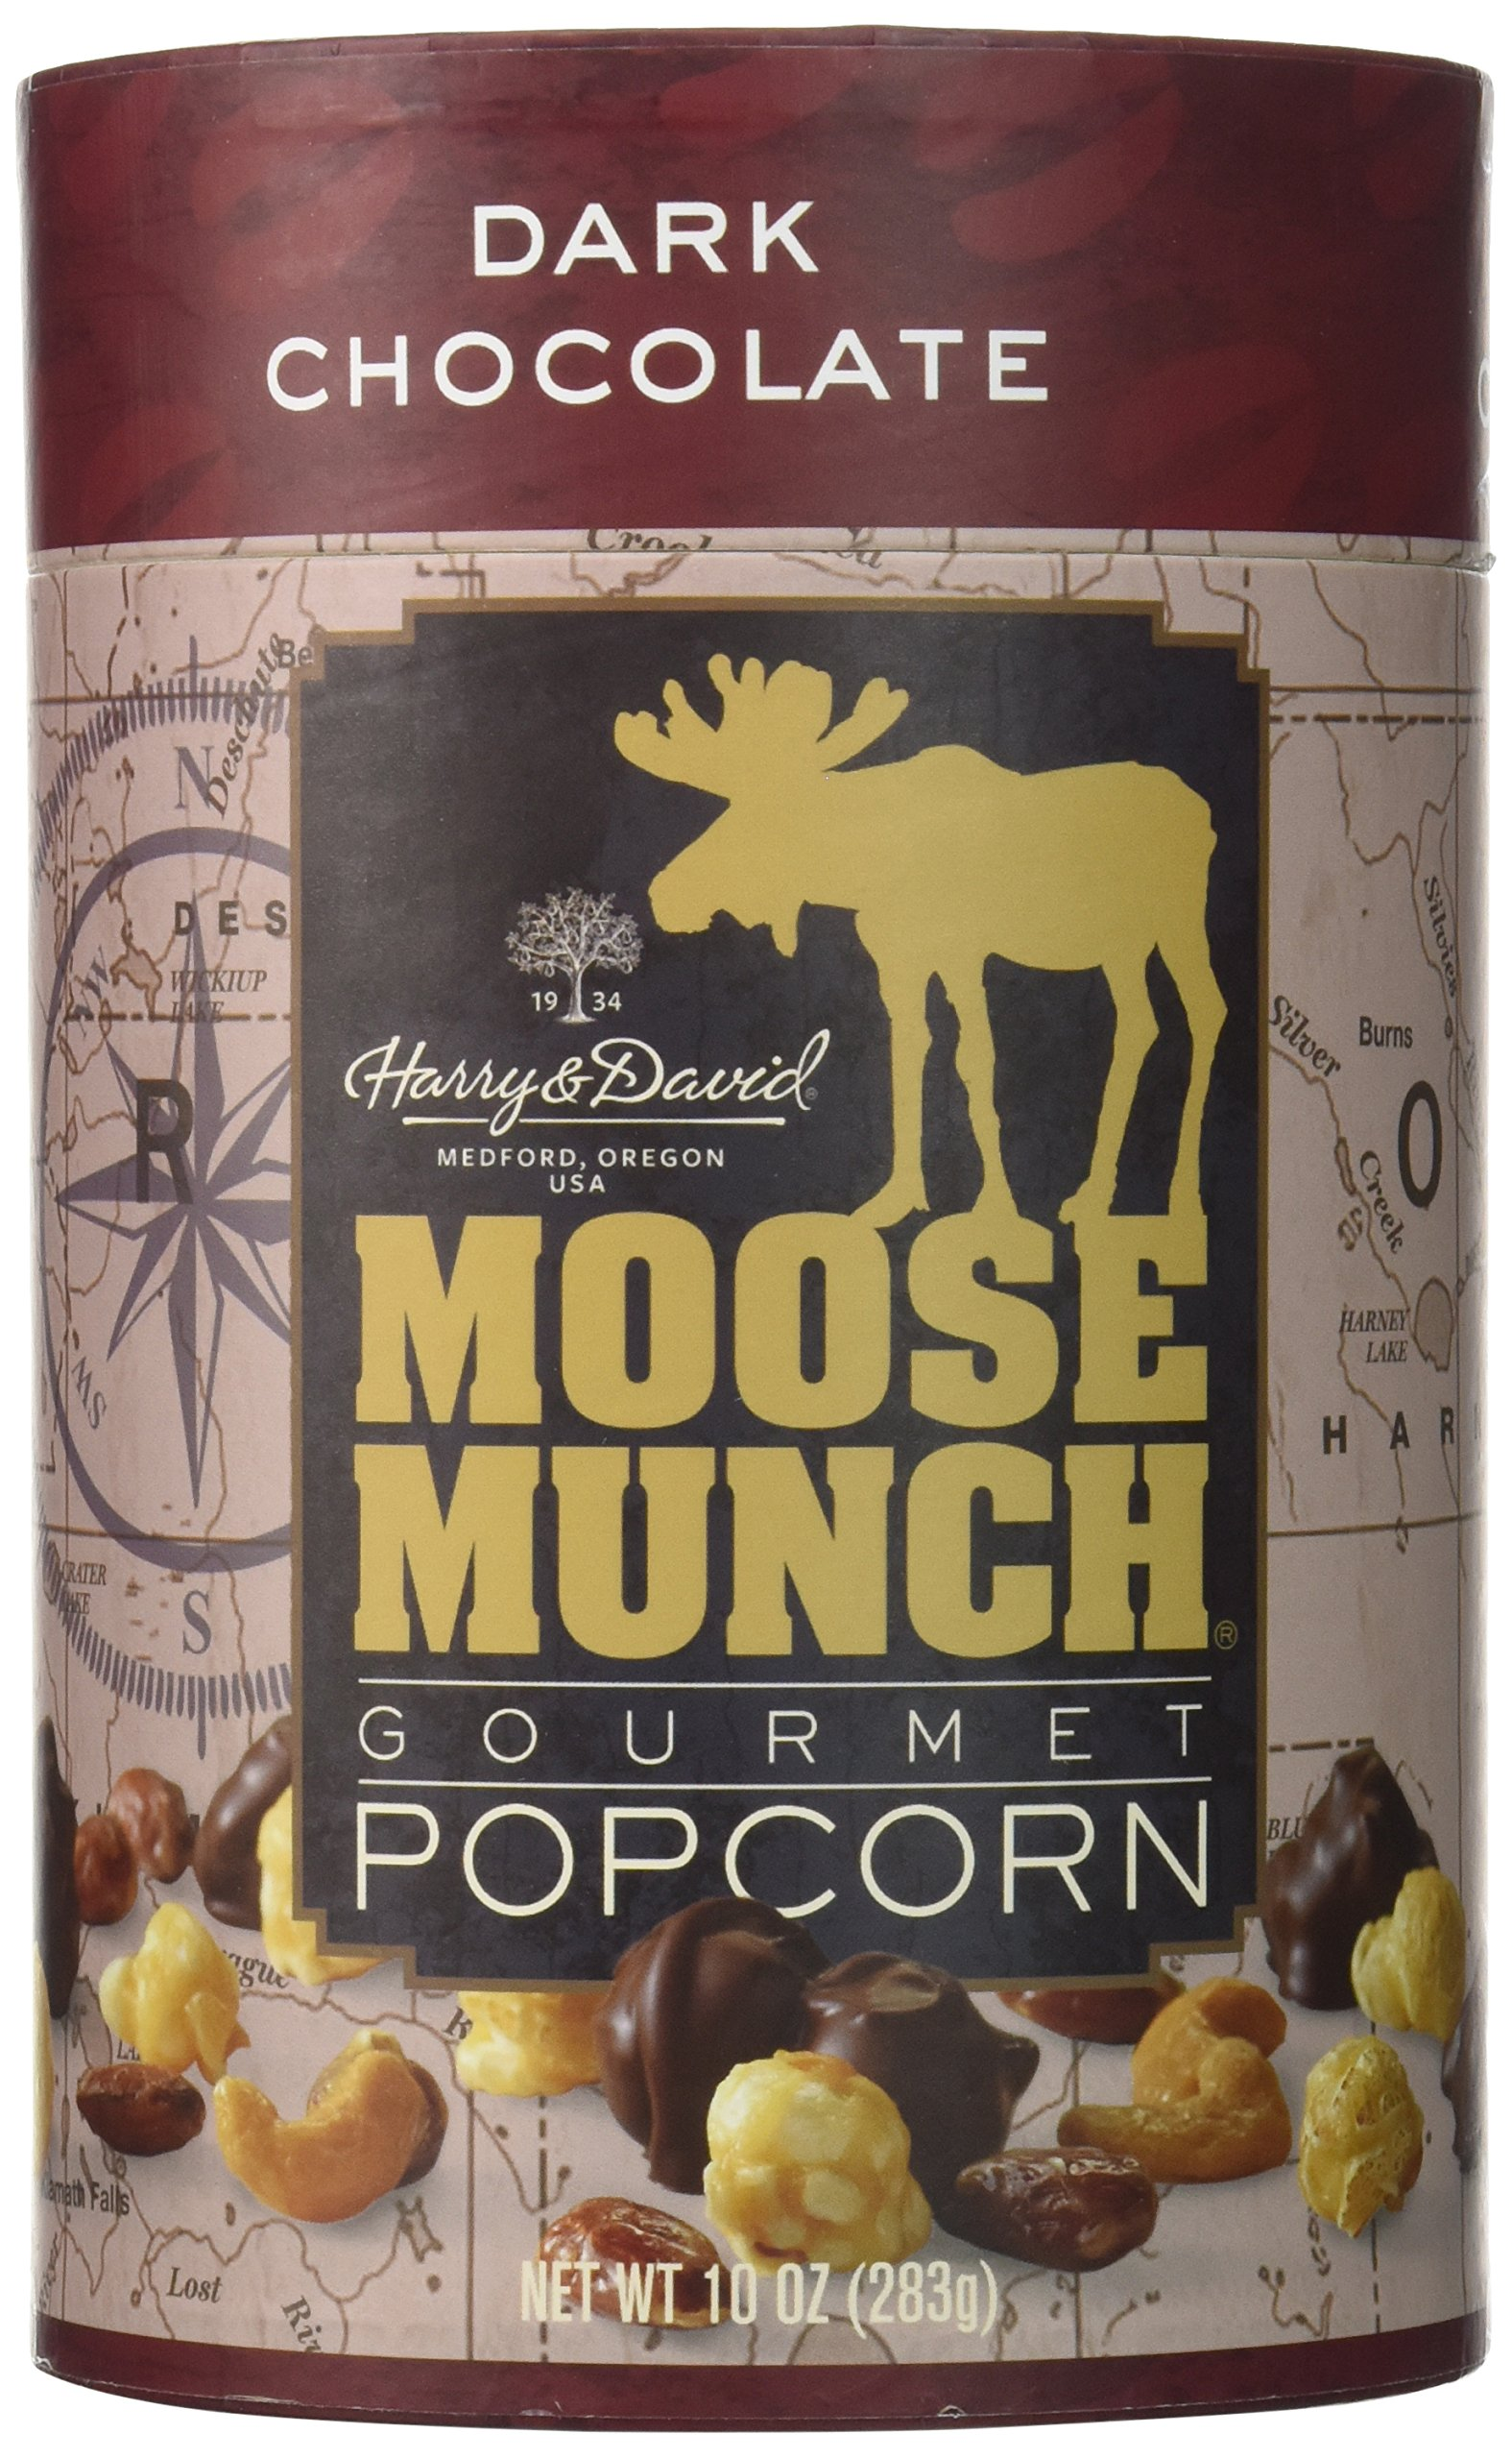 Harry & David, Moose Munch Gourmet Popcorn, Dark Chocolate, 10 Oz.